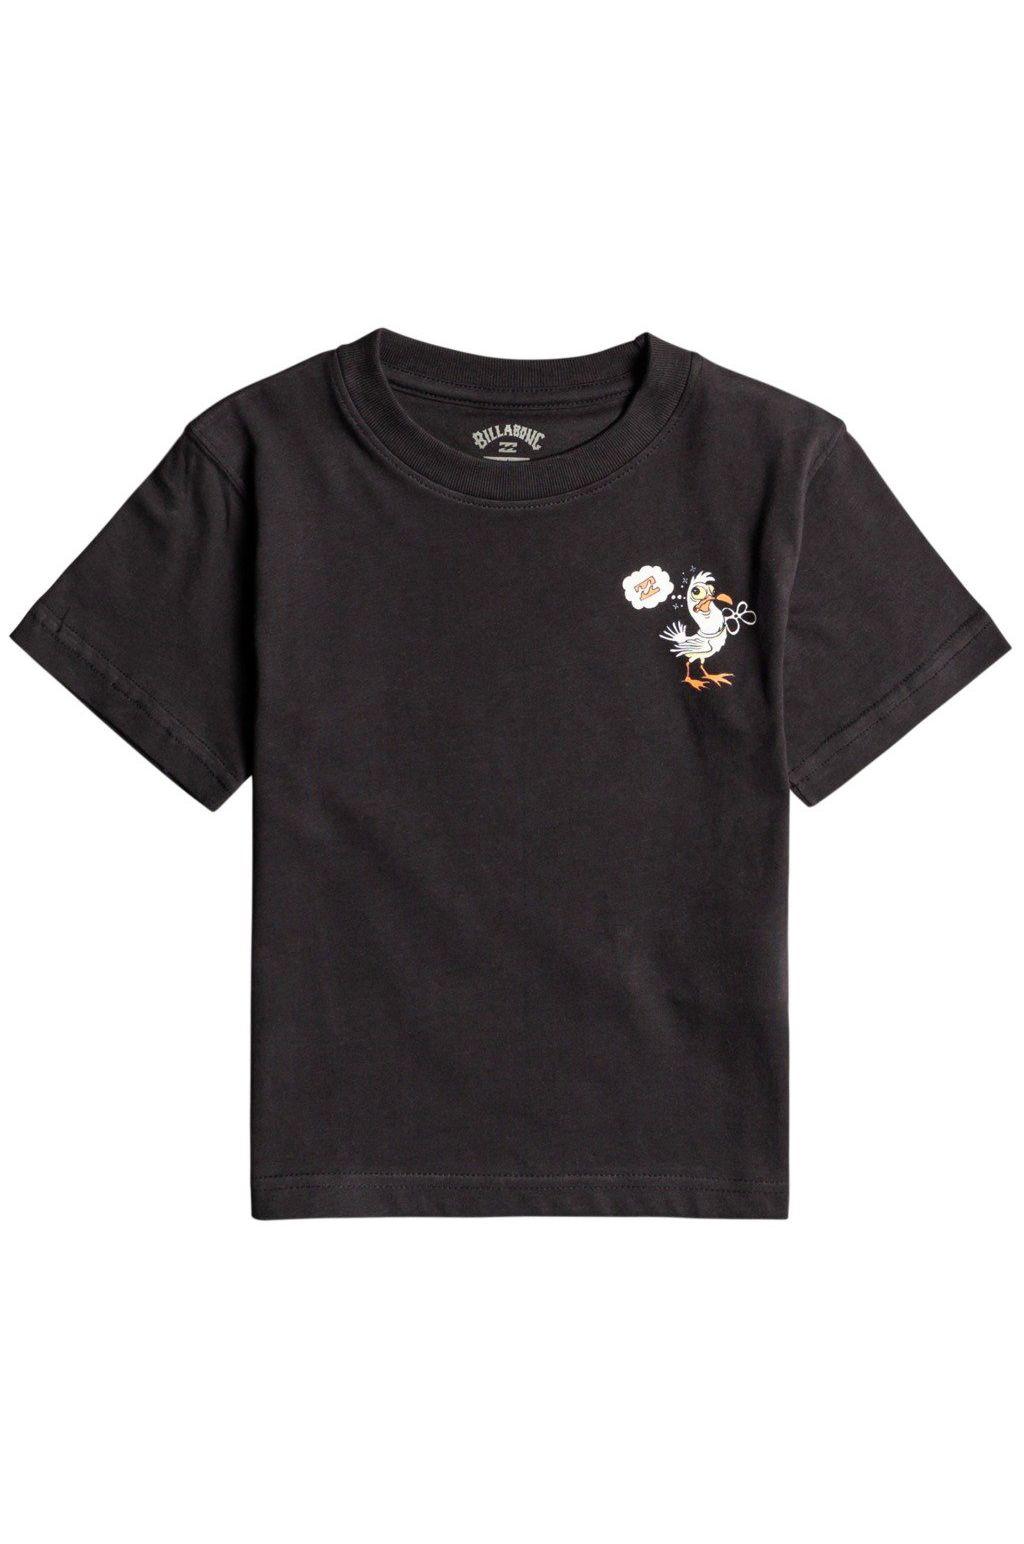 Billabong T-Shirt ENCOUTERS SS TODDLER Black